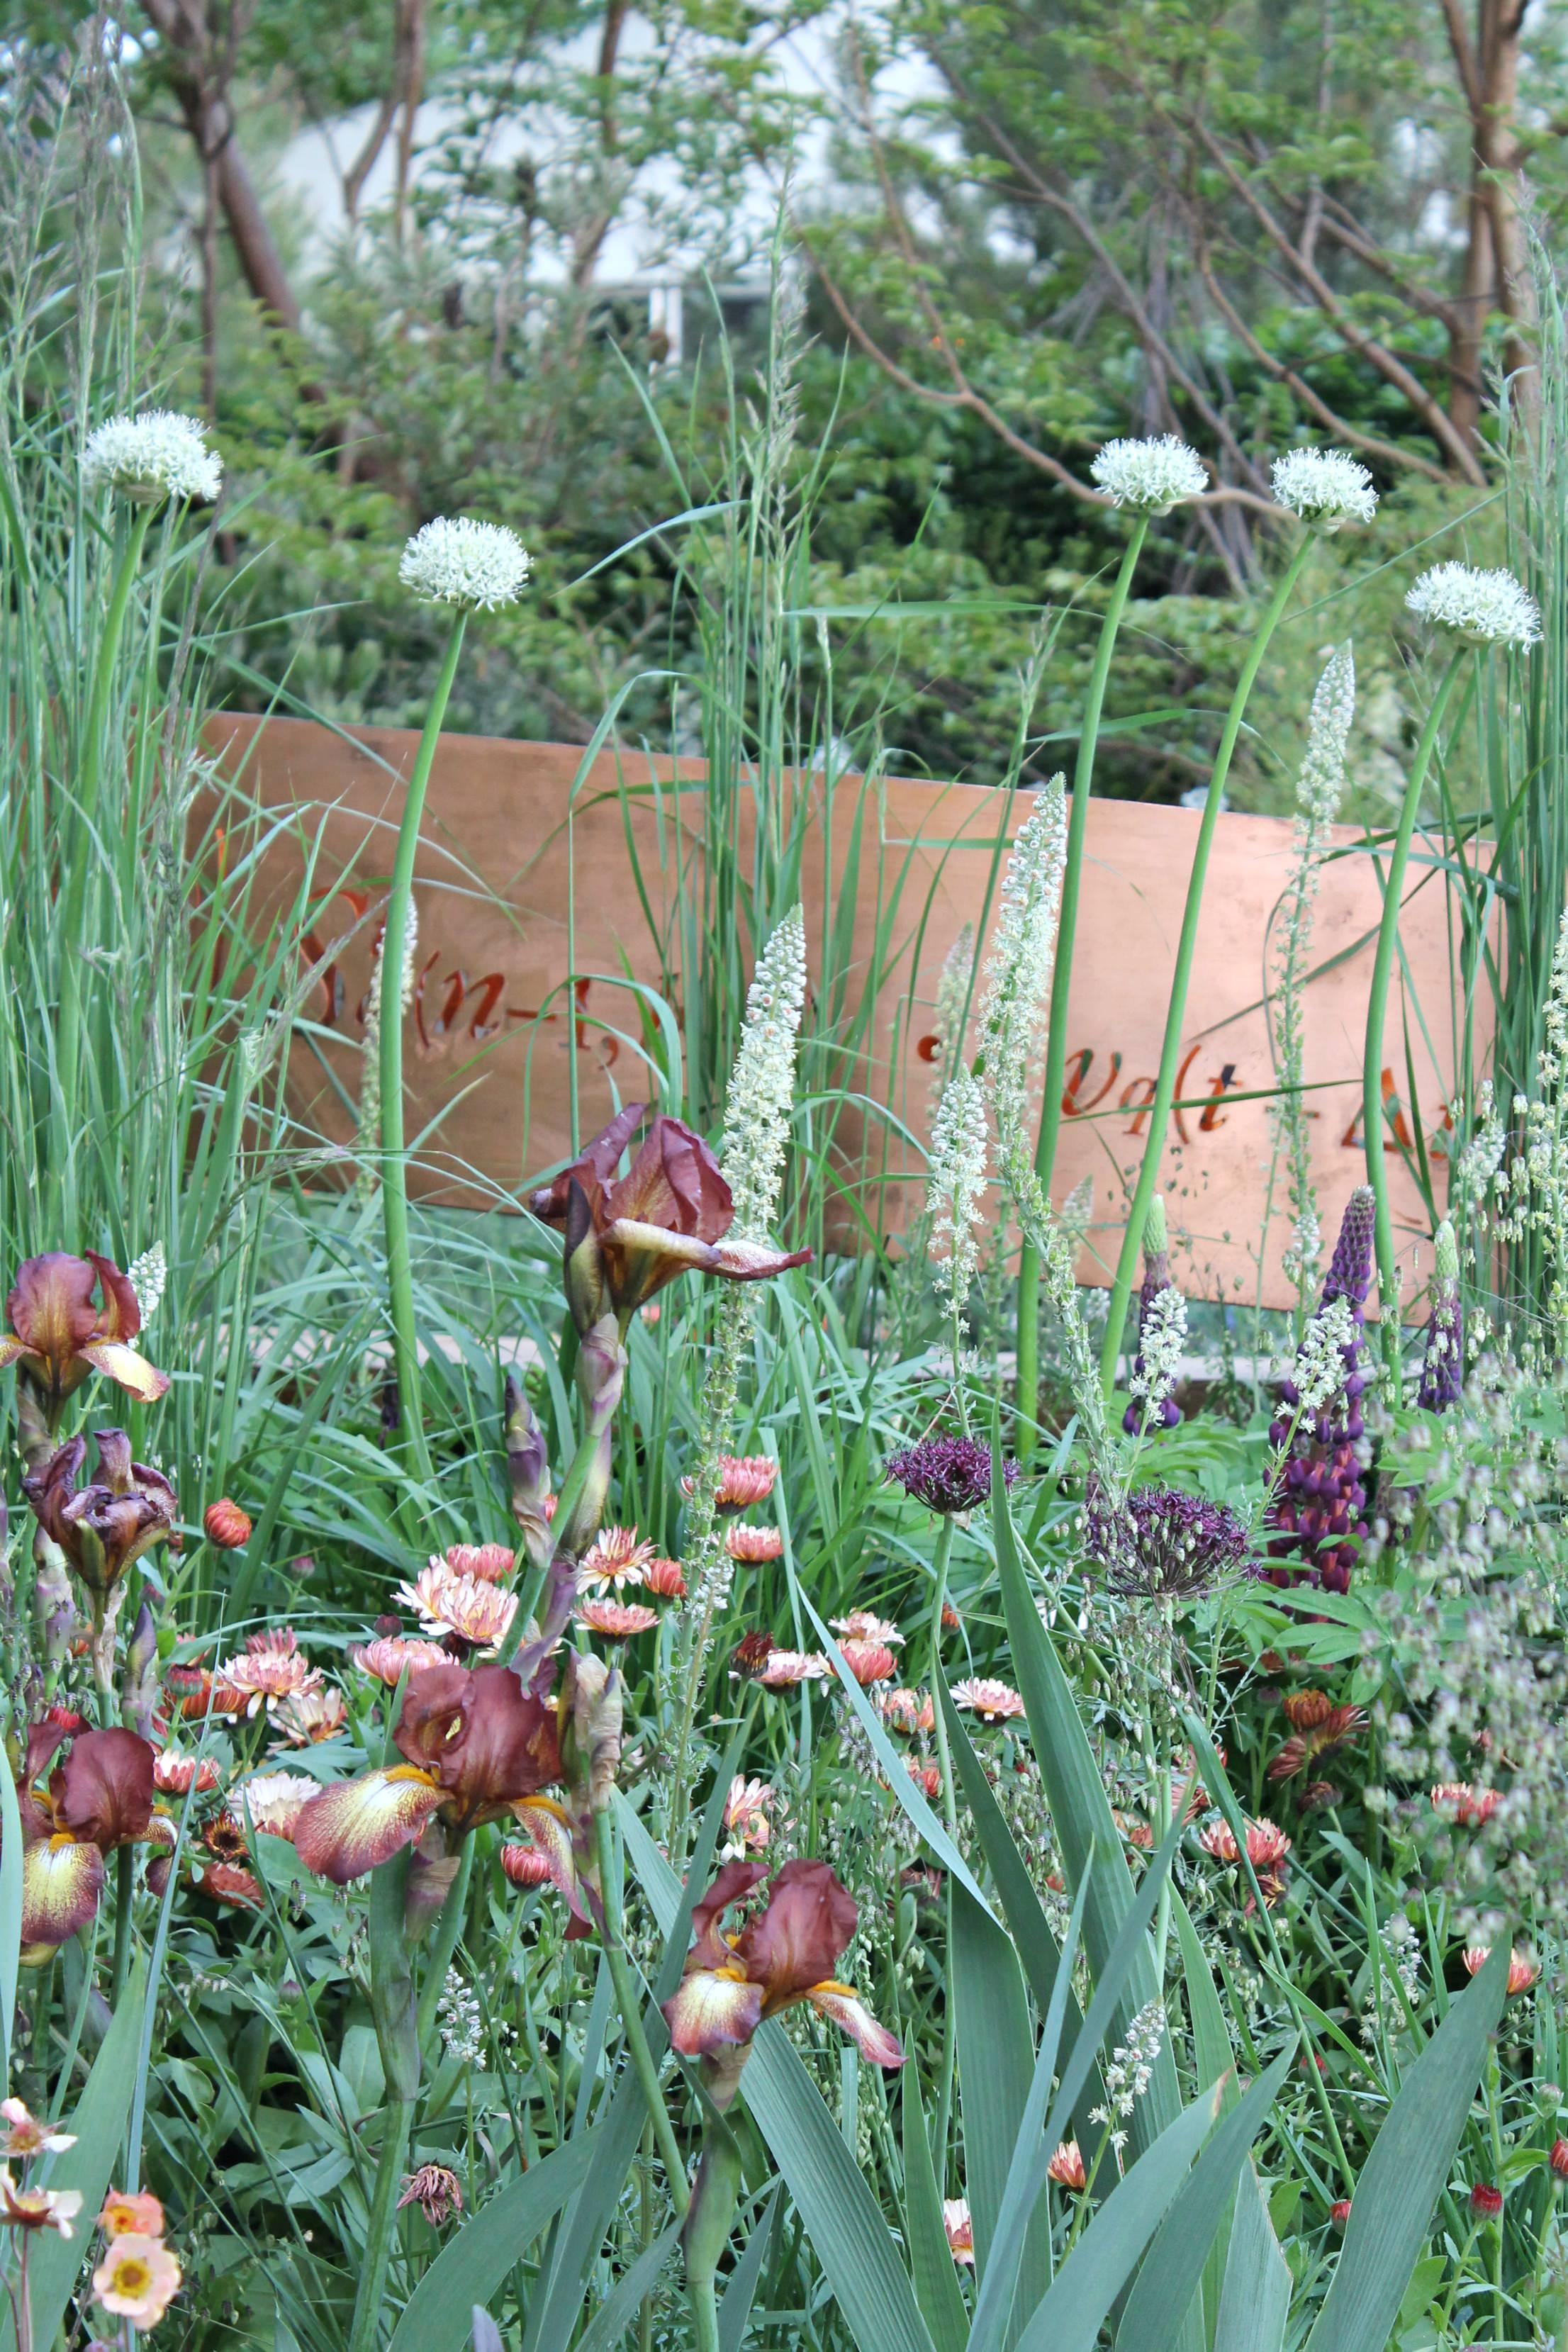 mathematics-garden-photo-by-Geraldine-Tan-of-Little-Big-Bell-lifestyle-blog